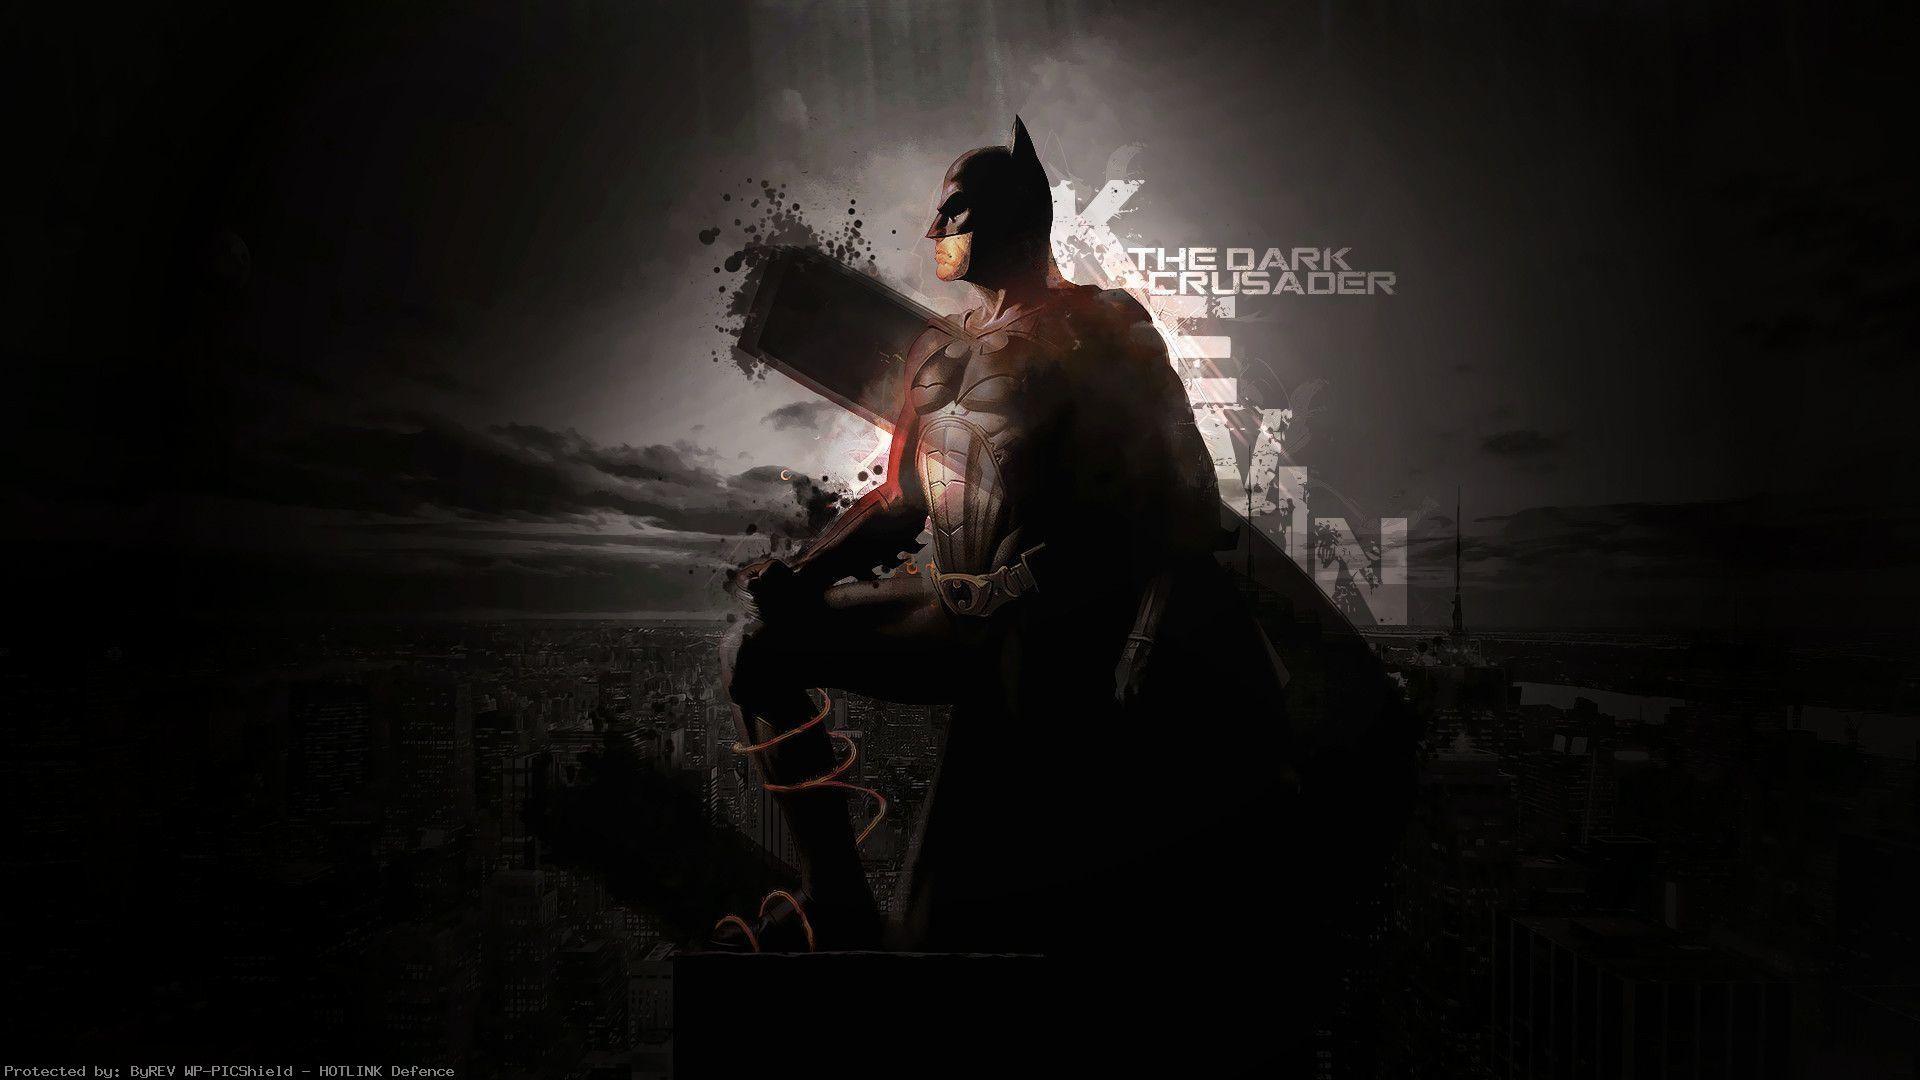 Batman-HD-download-free-wallpaper-wp6003208